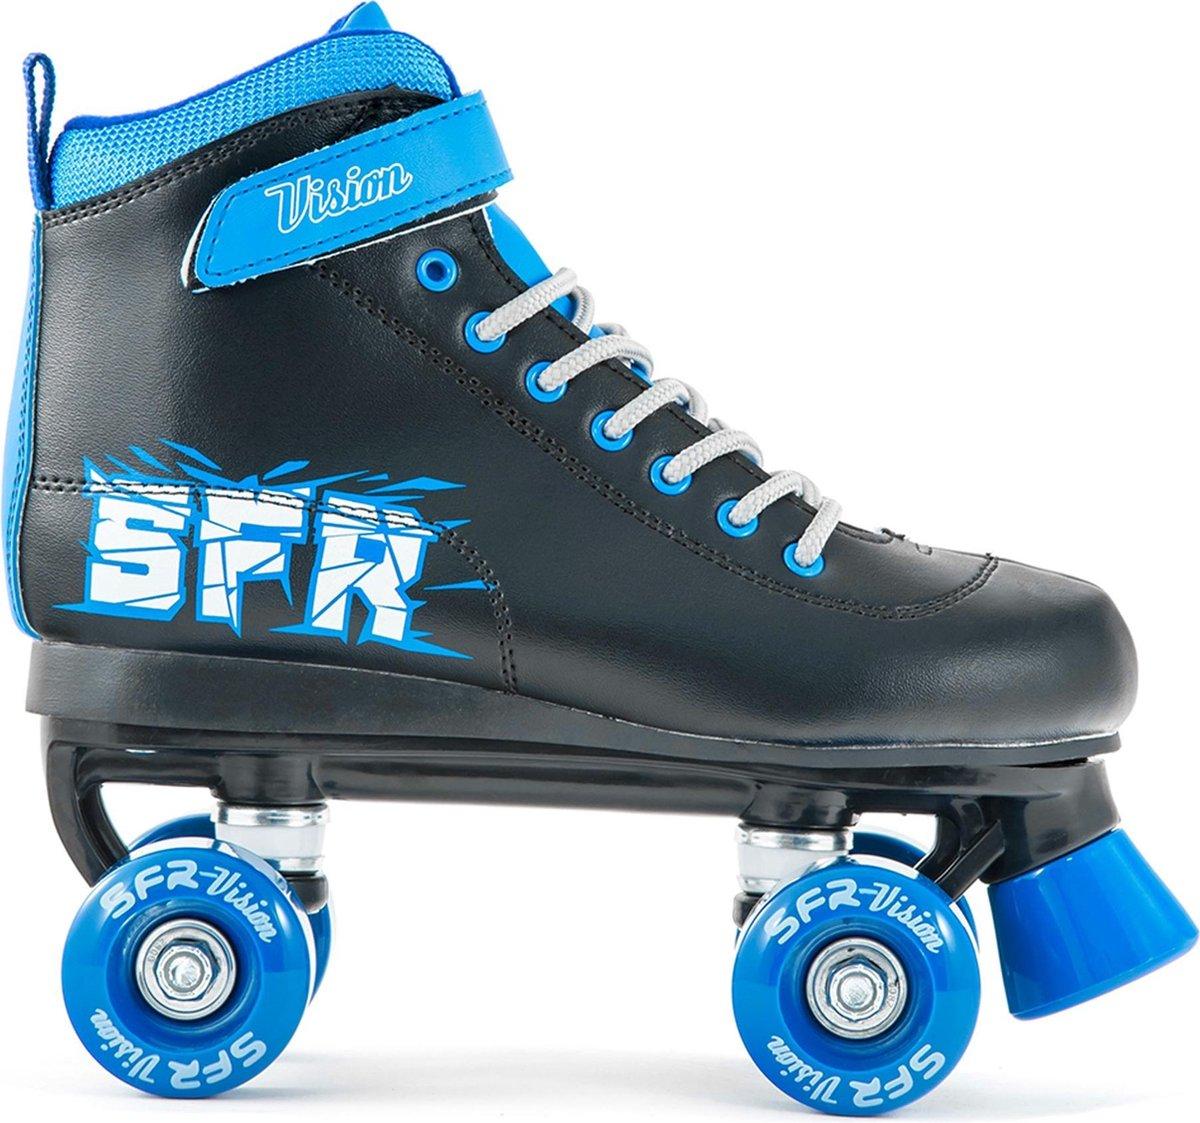 SFR Skates Rolschaatsen SFR Vision II blauw - Maat 32